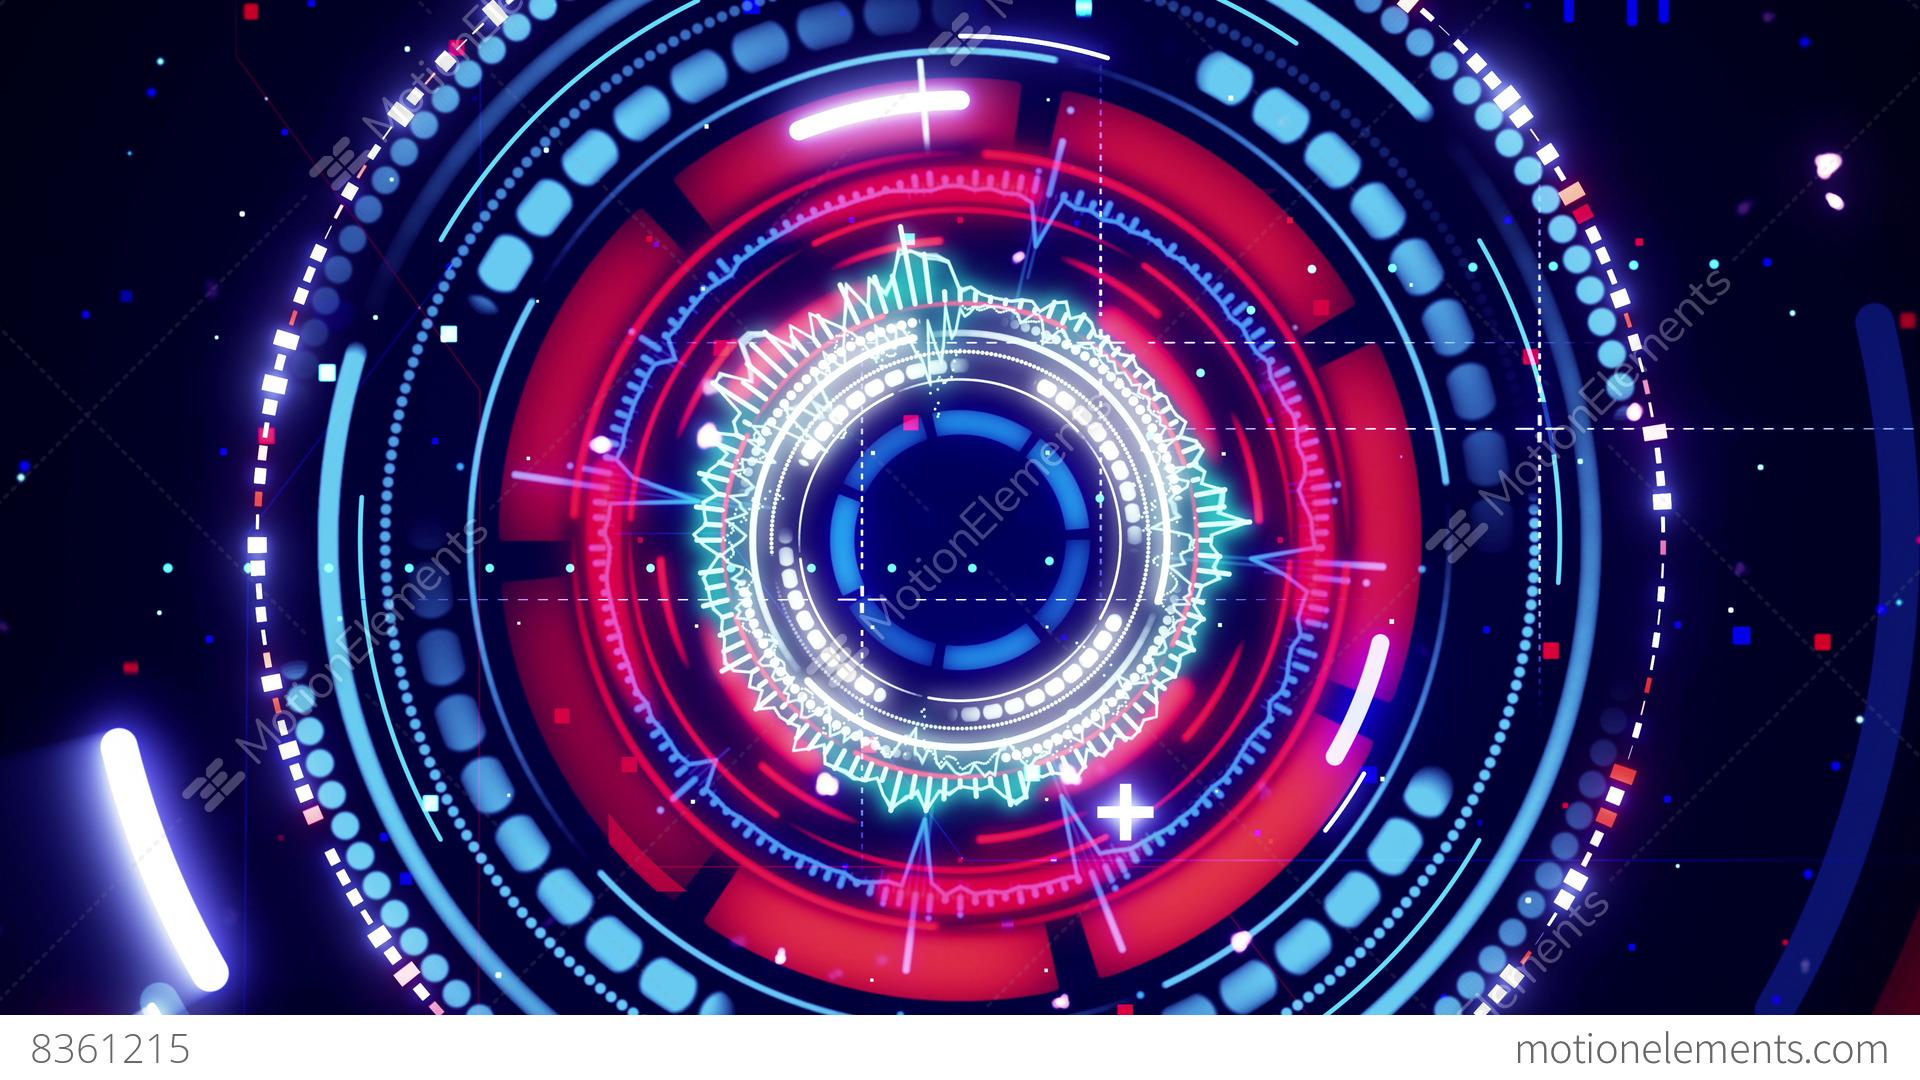 circular spectrum analyzer futuristic loopable animation 4k